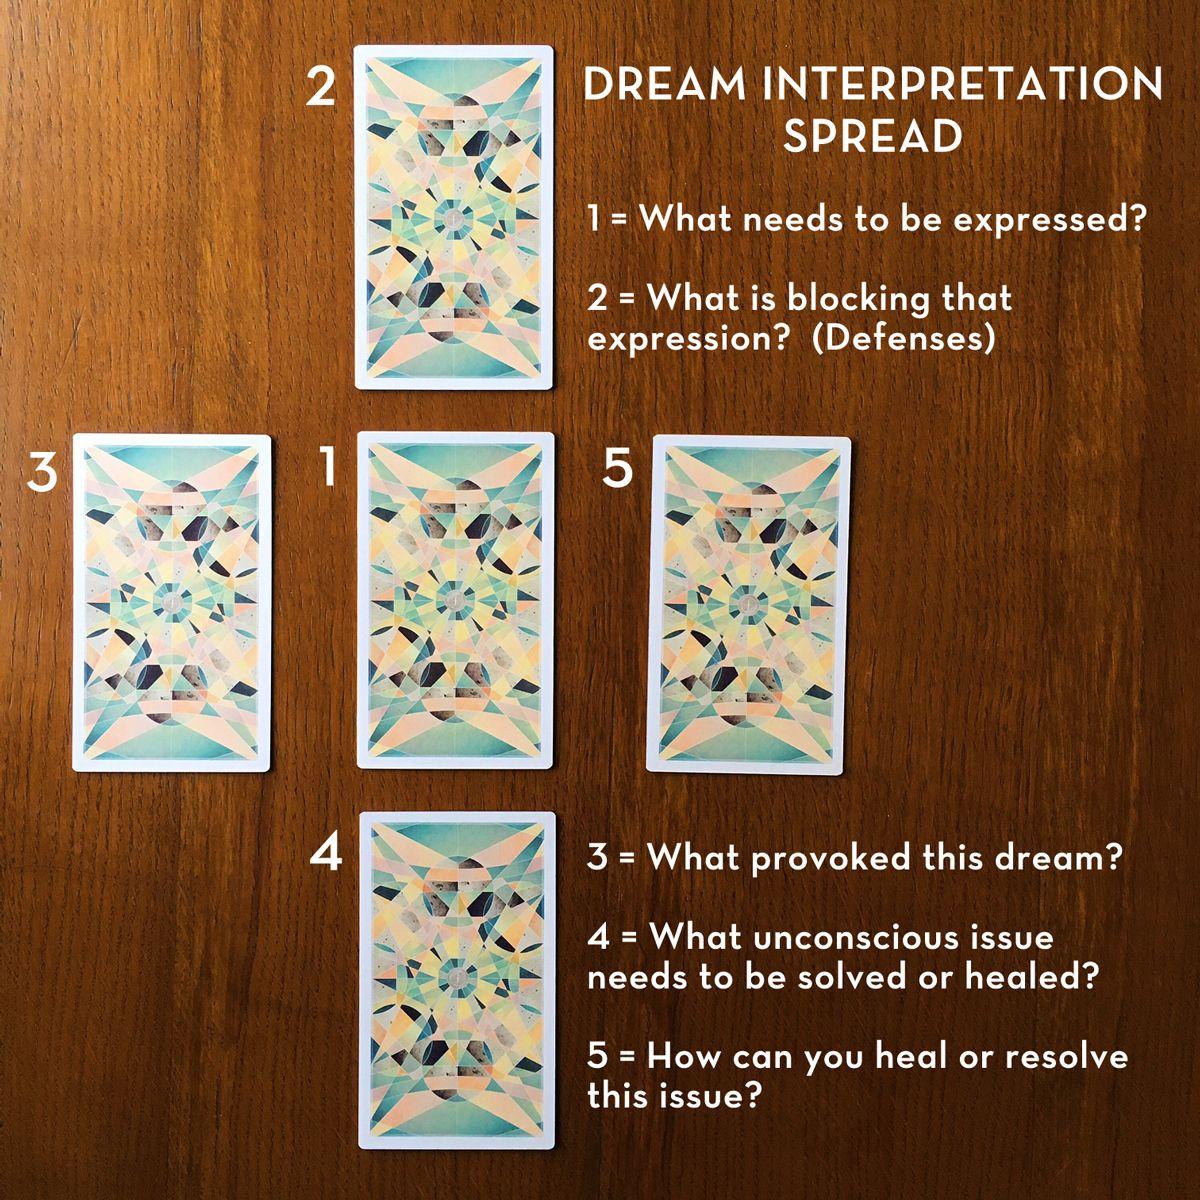 5card dream interpretation tarot spread using fountain